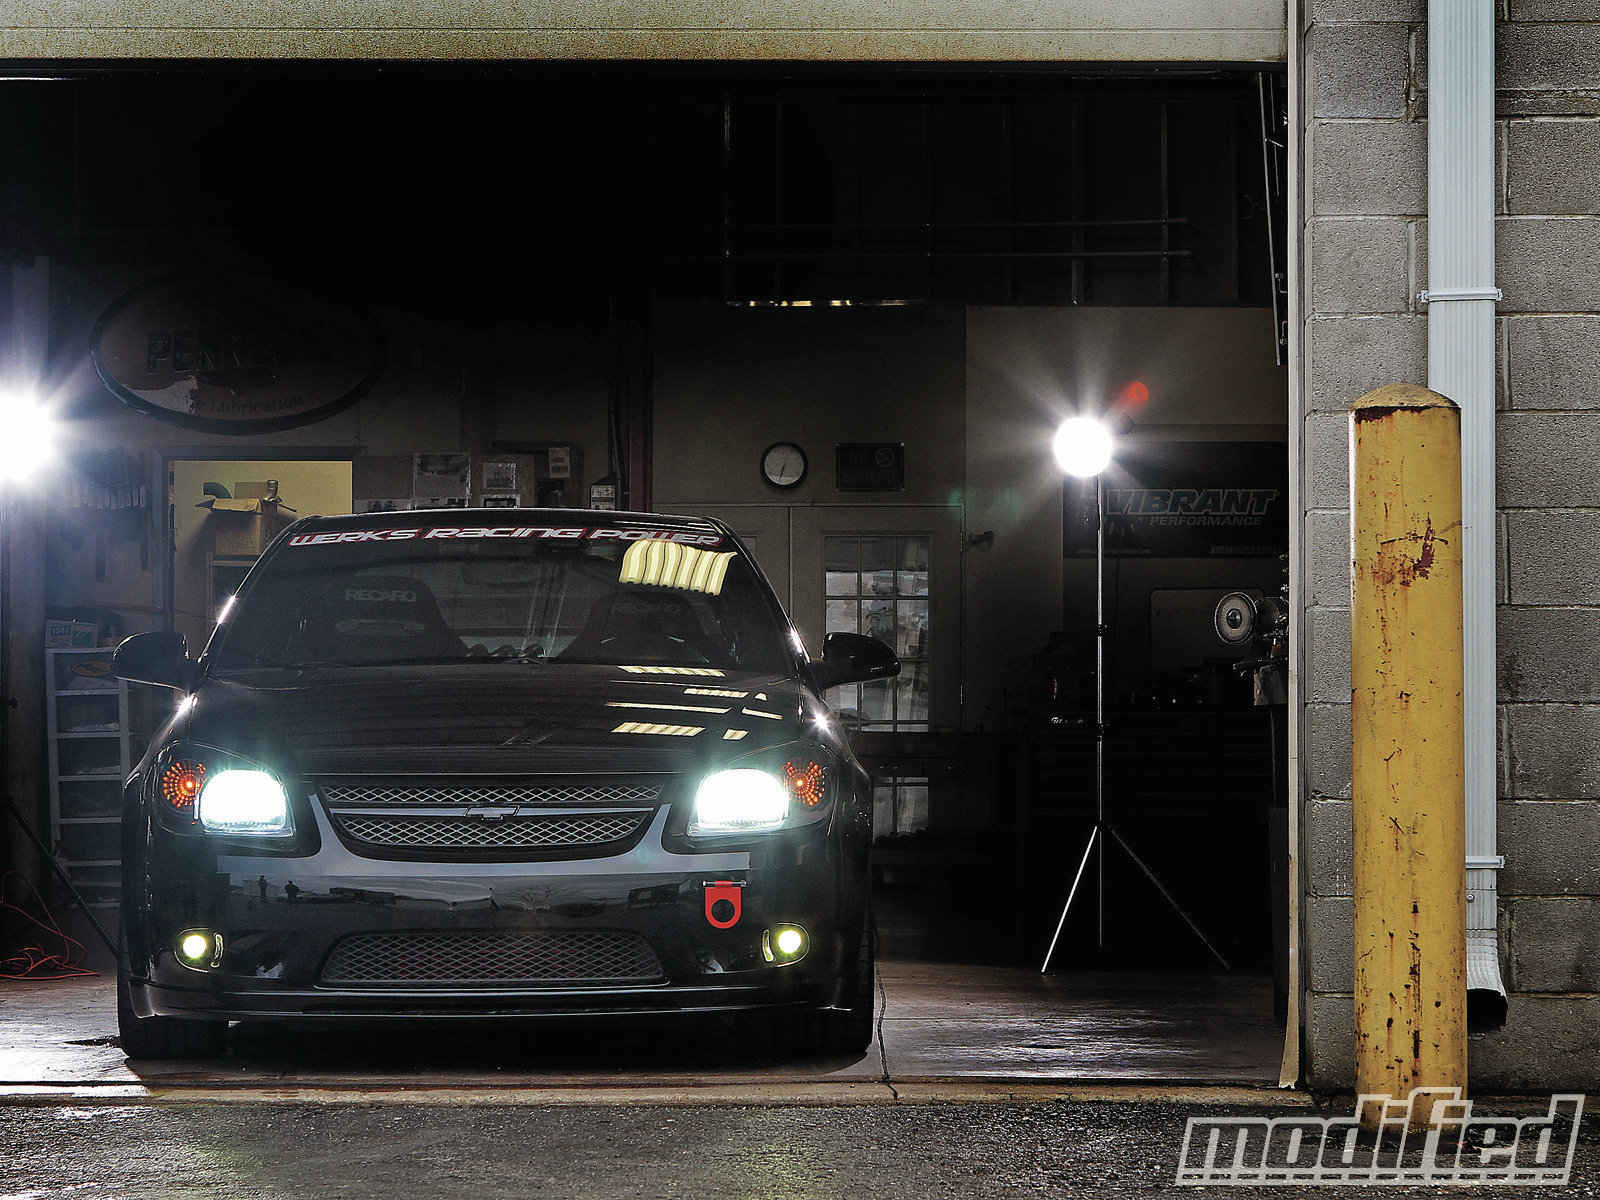 2008 Chevrolet Cobalt SS Turbo - Gettin' Respect - Modified